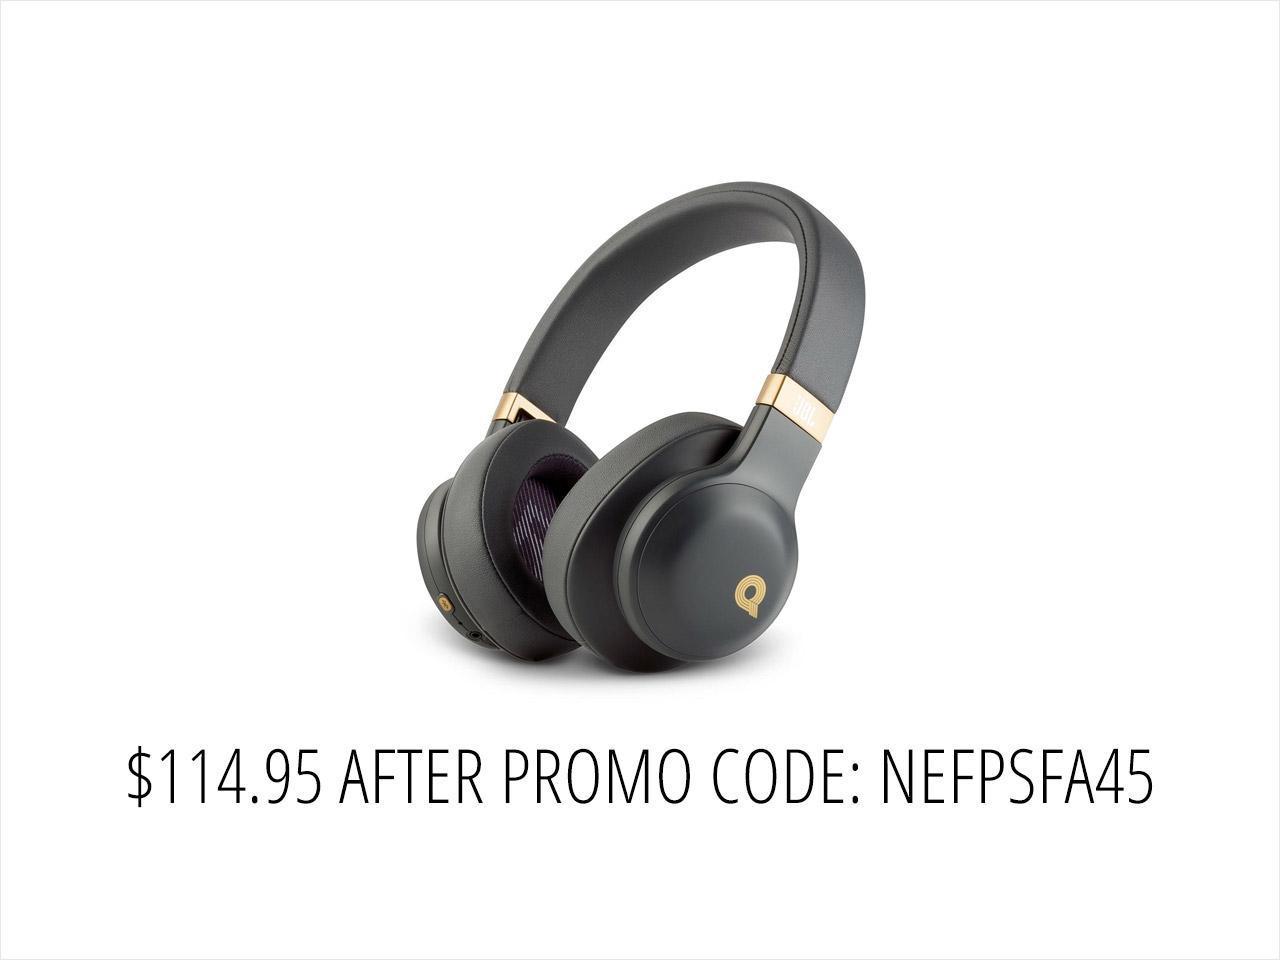 ecfa8e34cb2935 JBL E55BT Quincy Edition Wireless Over-Ear Headphones -Black ...